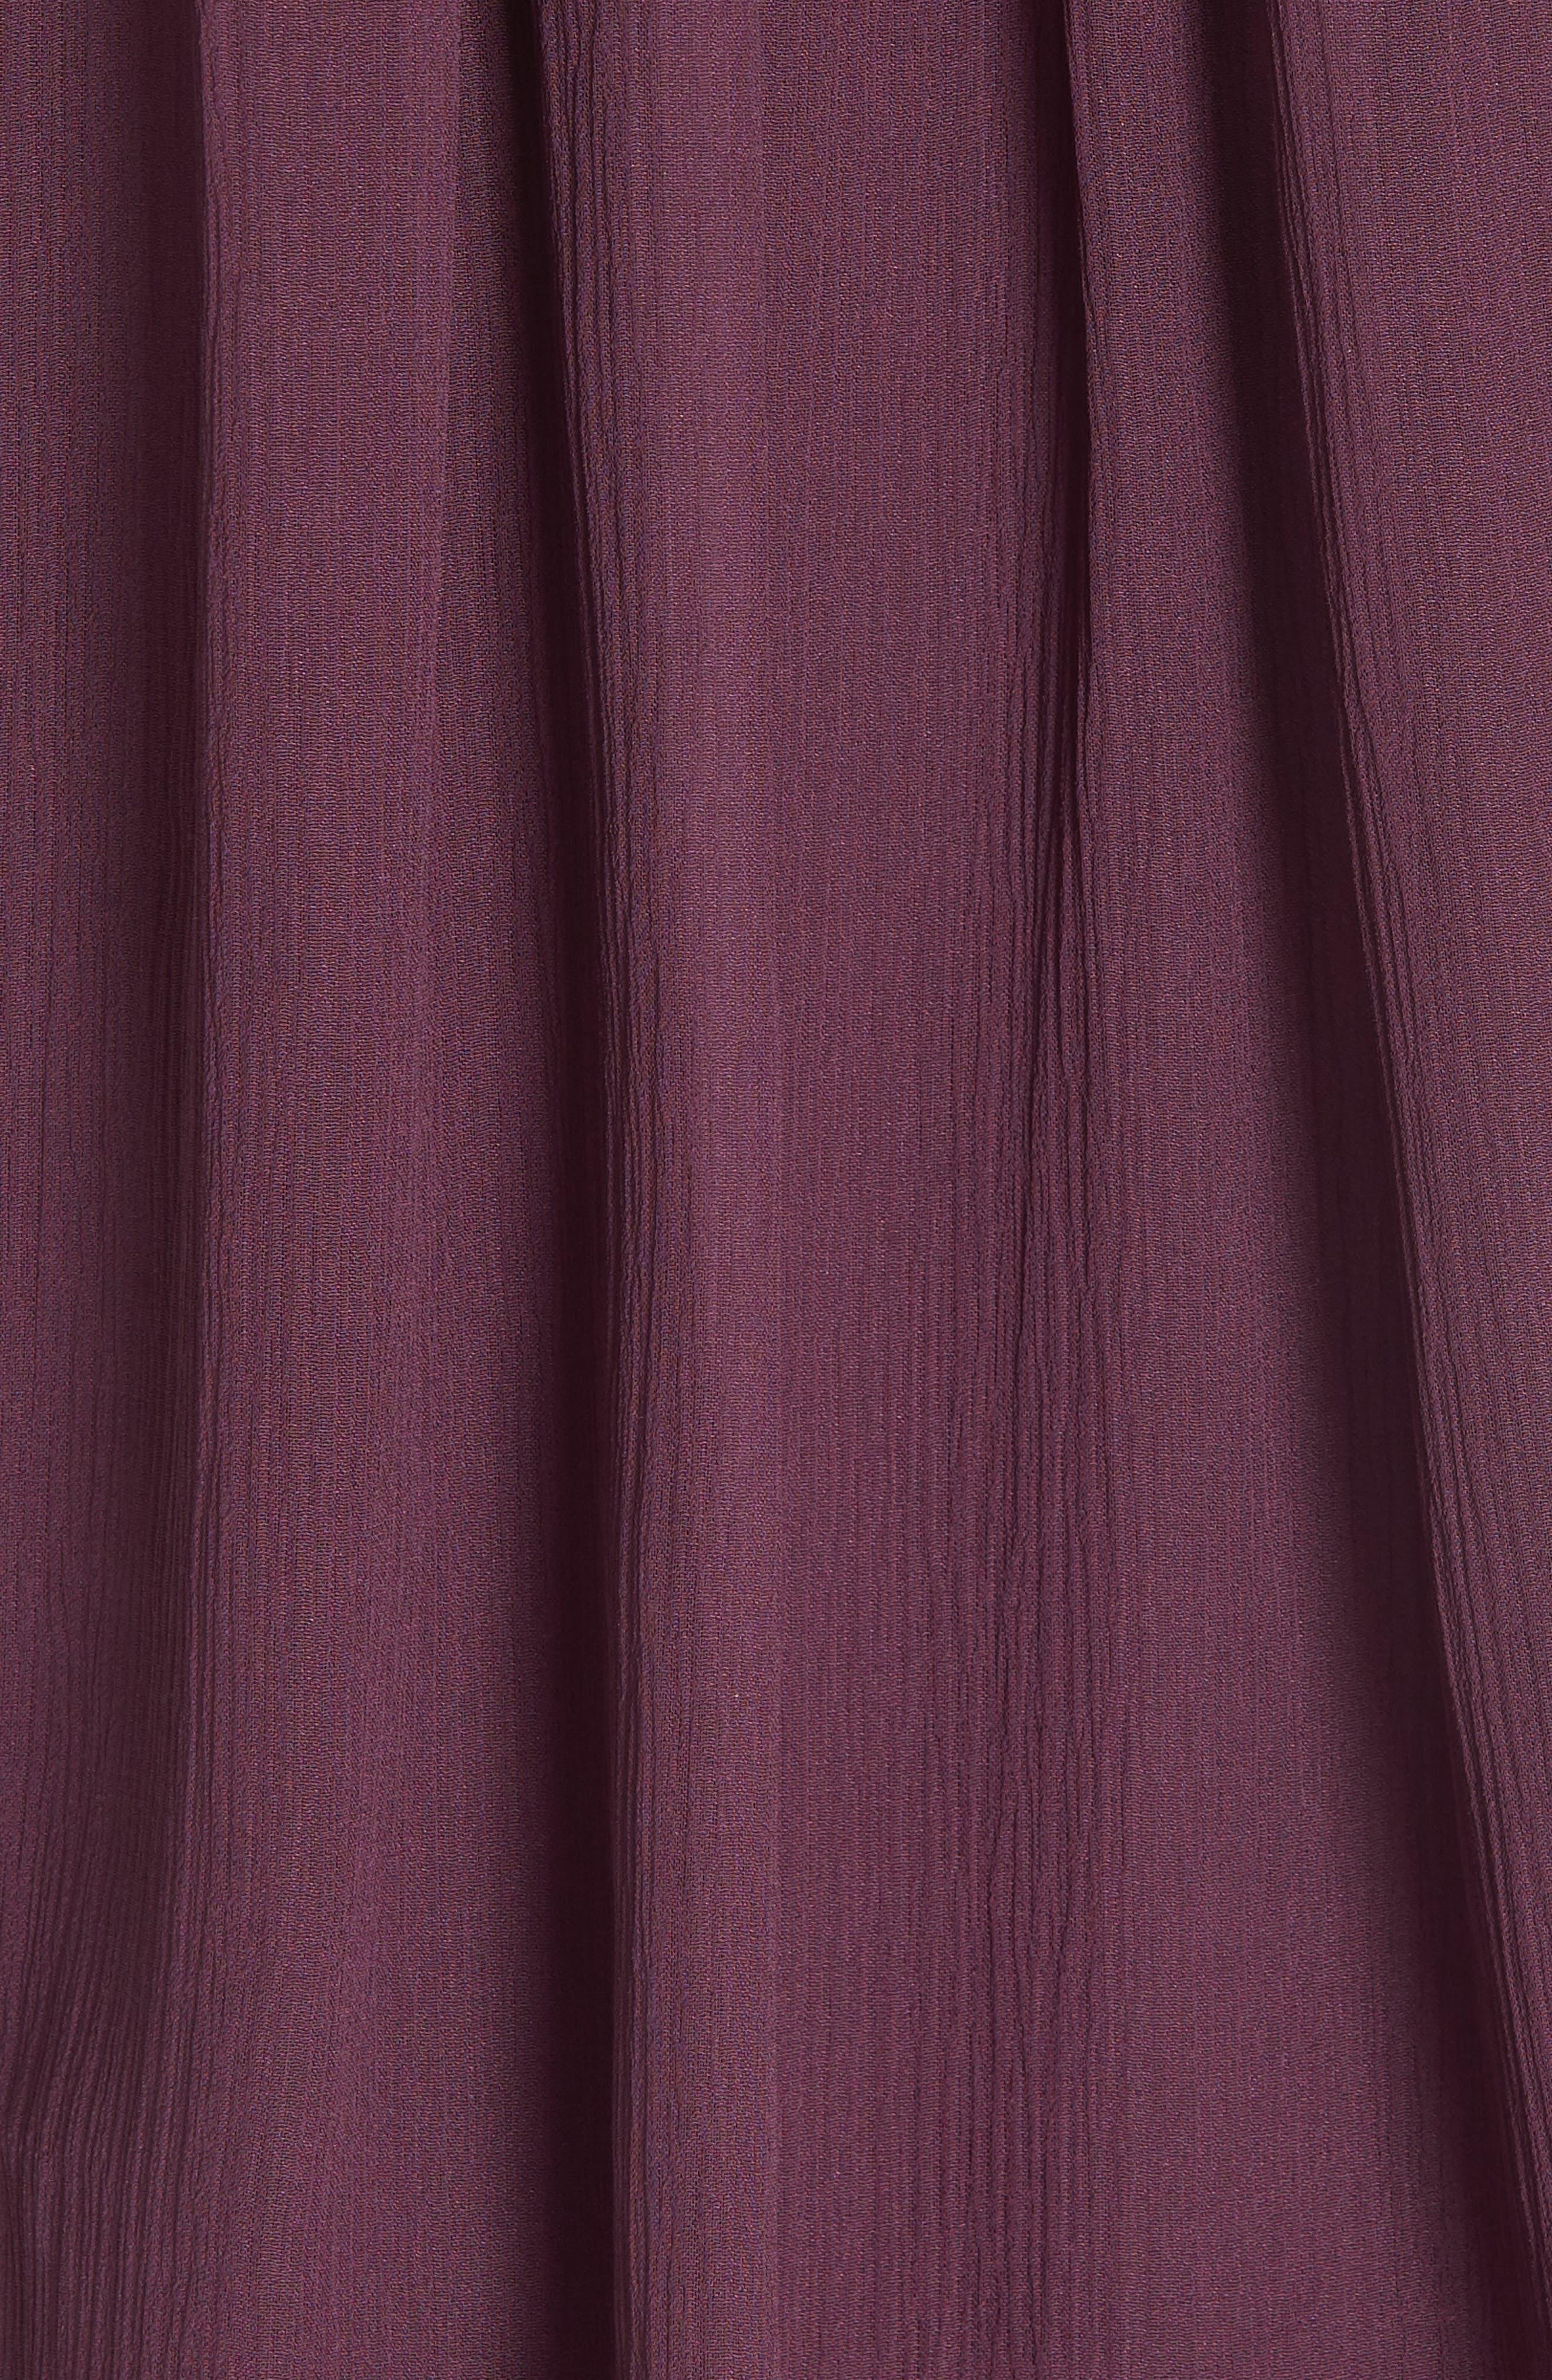 POLO RALPH LAUREN,                             Silk Peasant Blouse,                             Alternate thumbnail 5, color,                             930